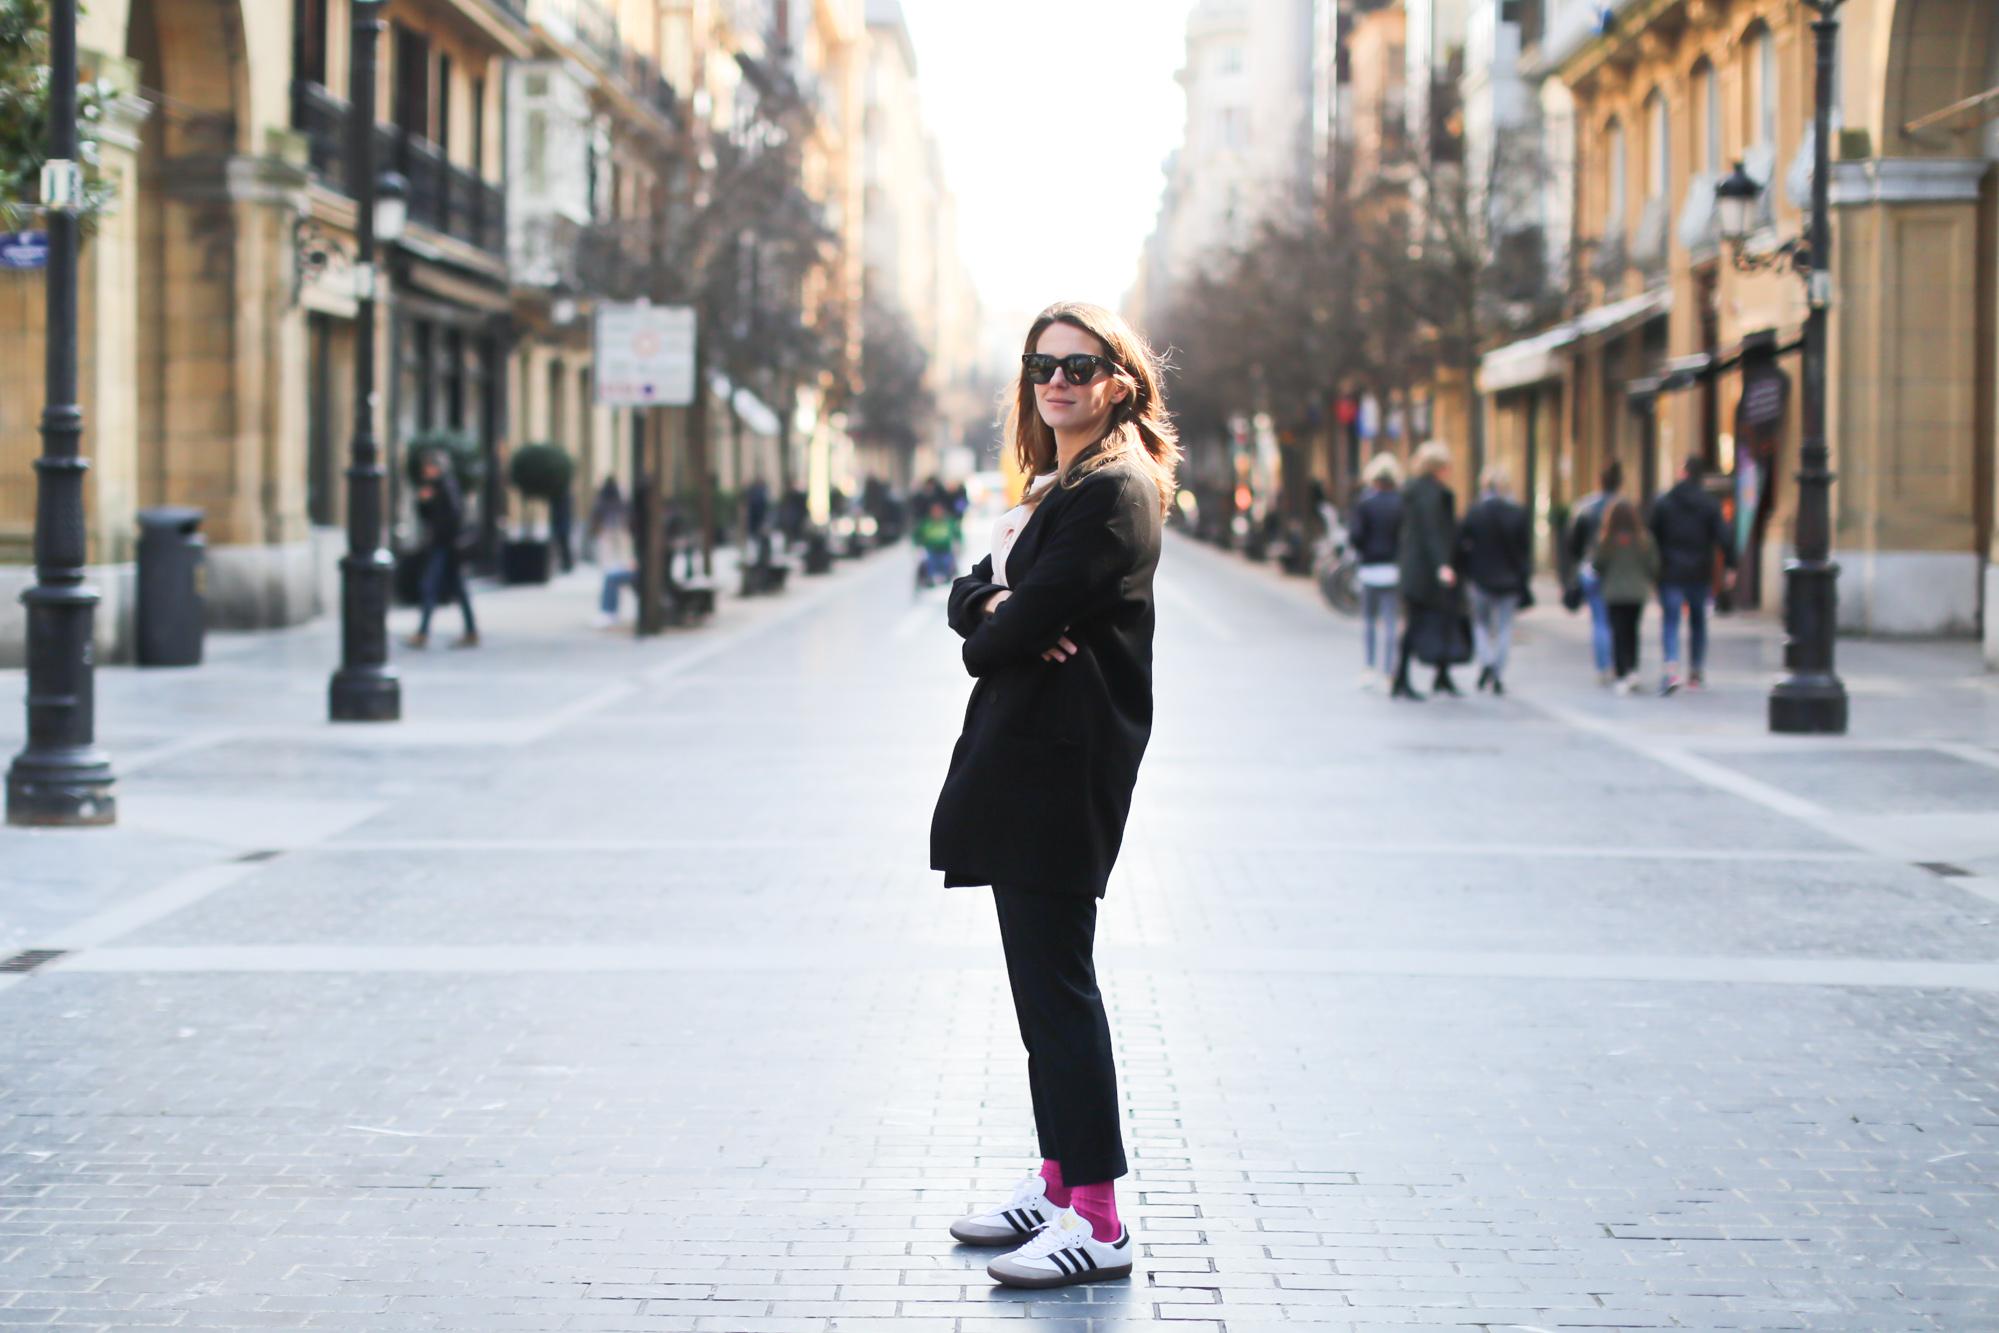 Clochet_streetstyle_fashionblogger_sudaderanudevolanteCOS_pantaloneschinoslanaCOS_adidasSambablancas-8